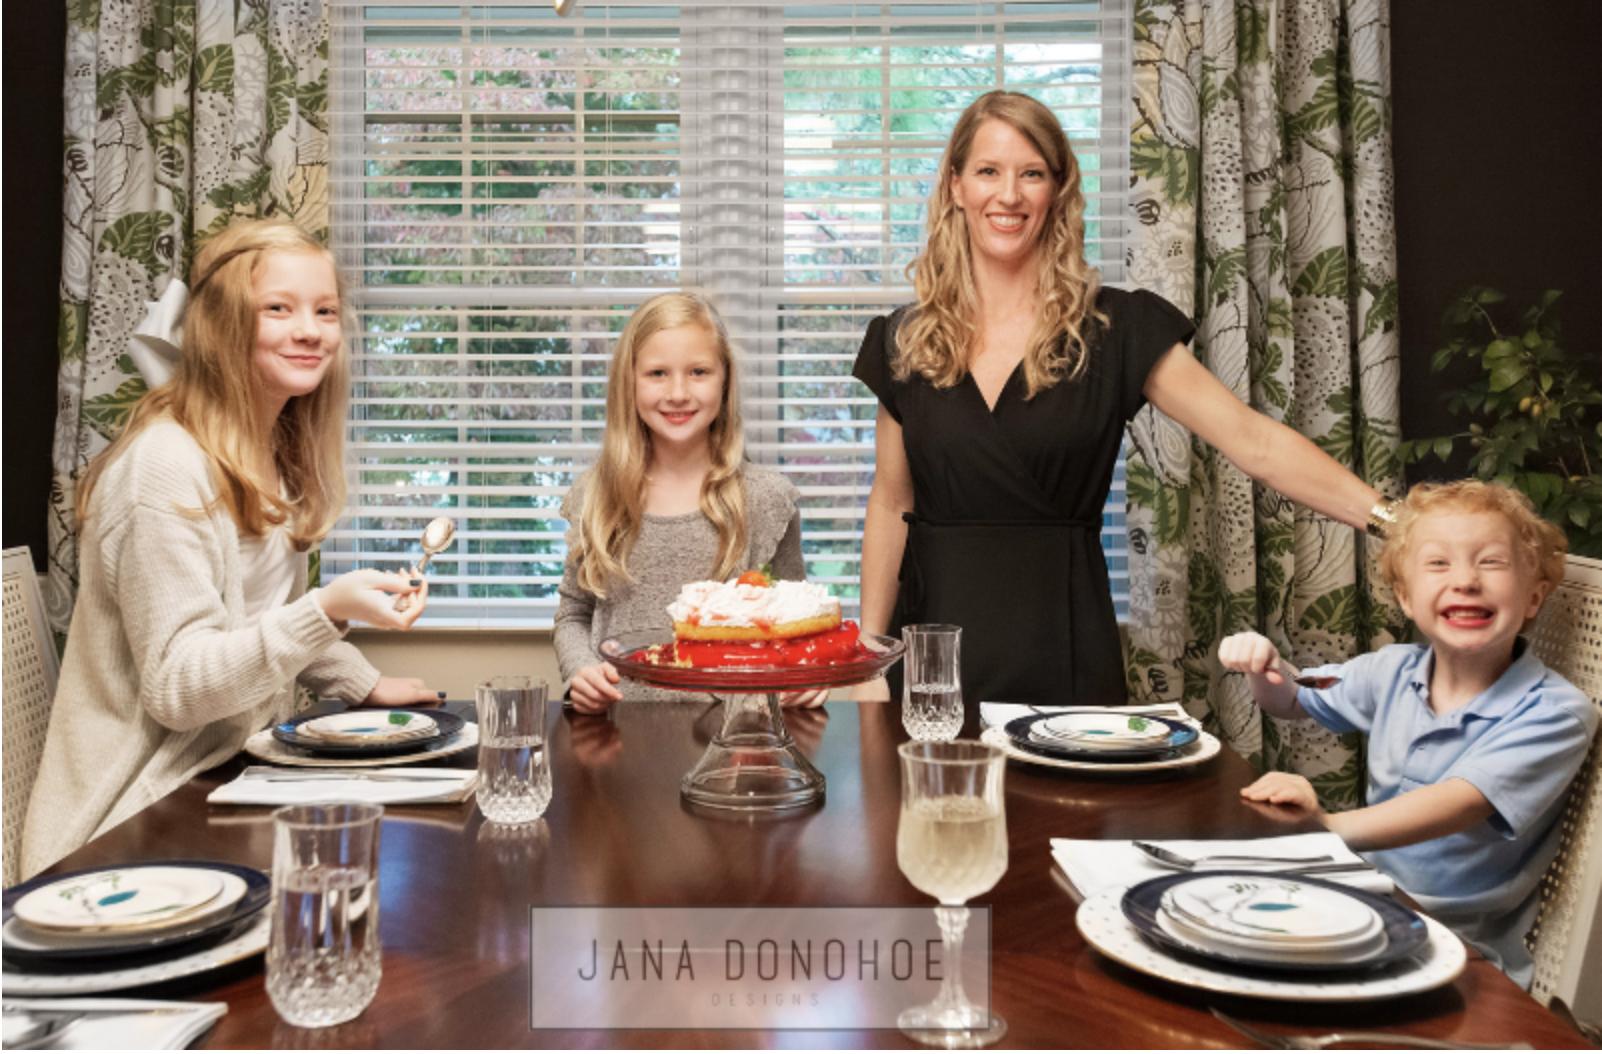 Jana Donohoe of Fayetteville, North Carolina based Jana Donohoe Designs with her 3 children, Thanksgiving 2018.